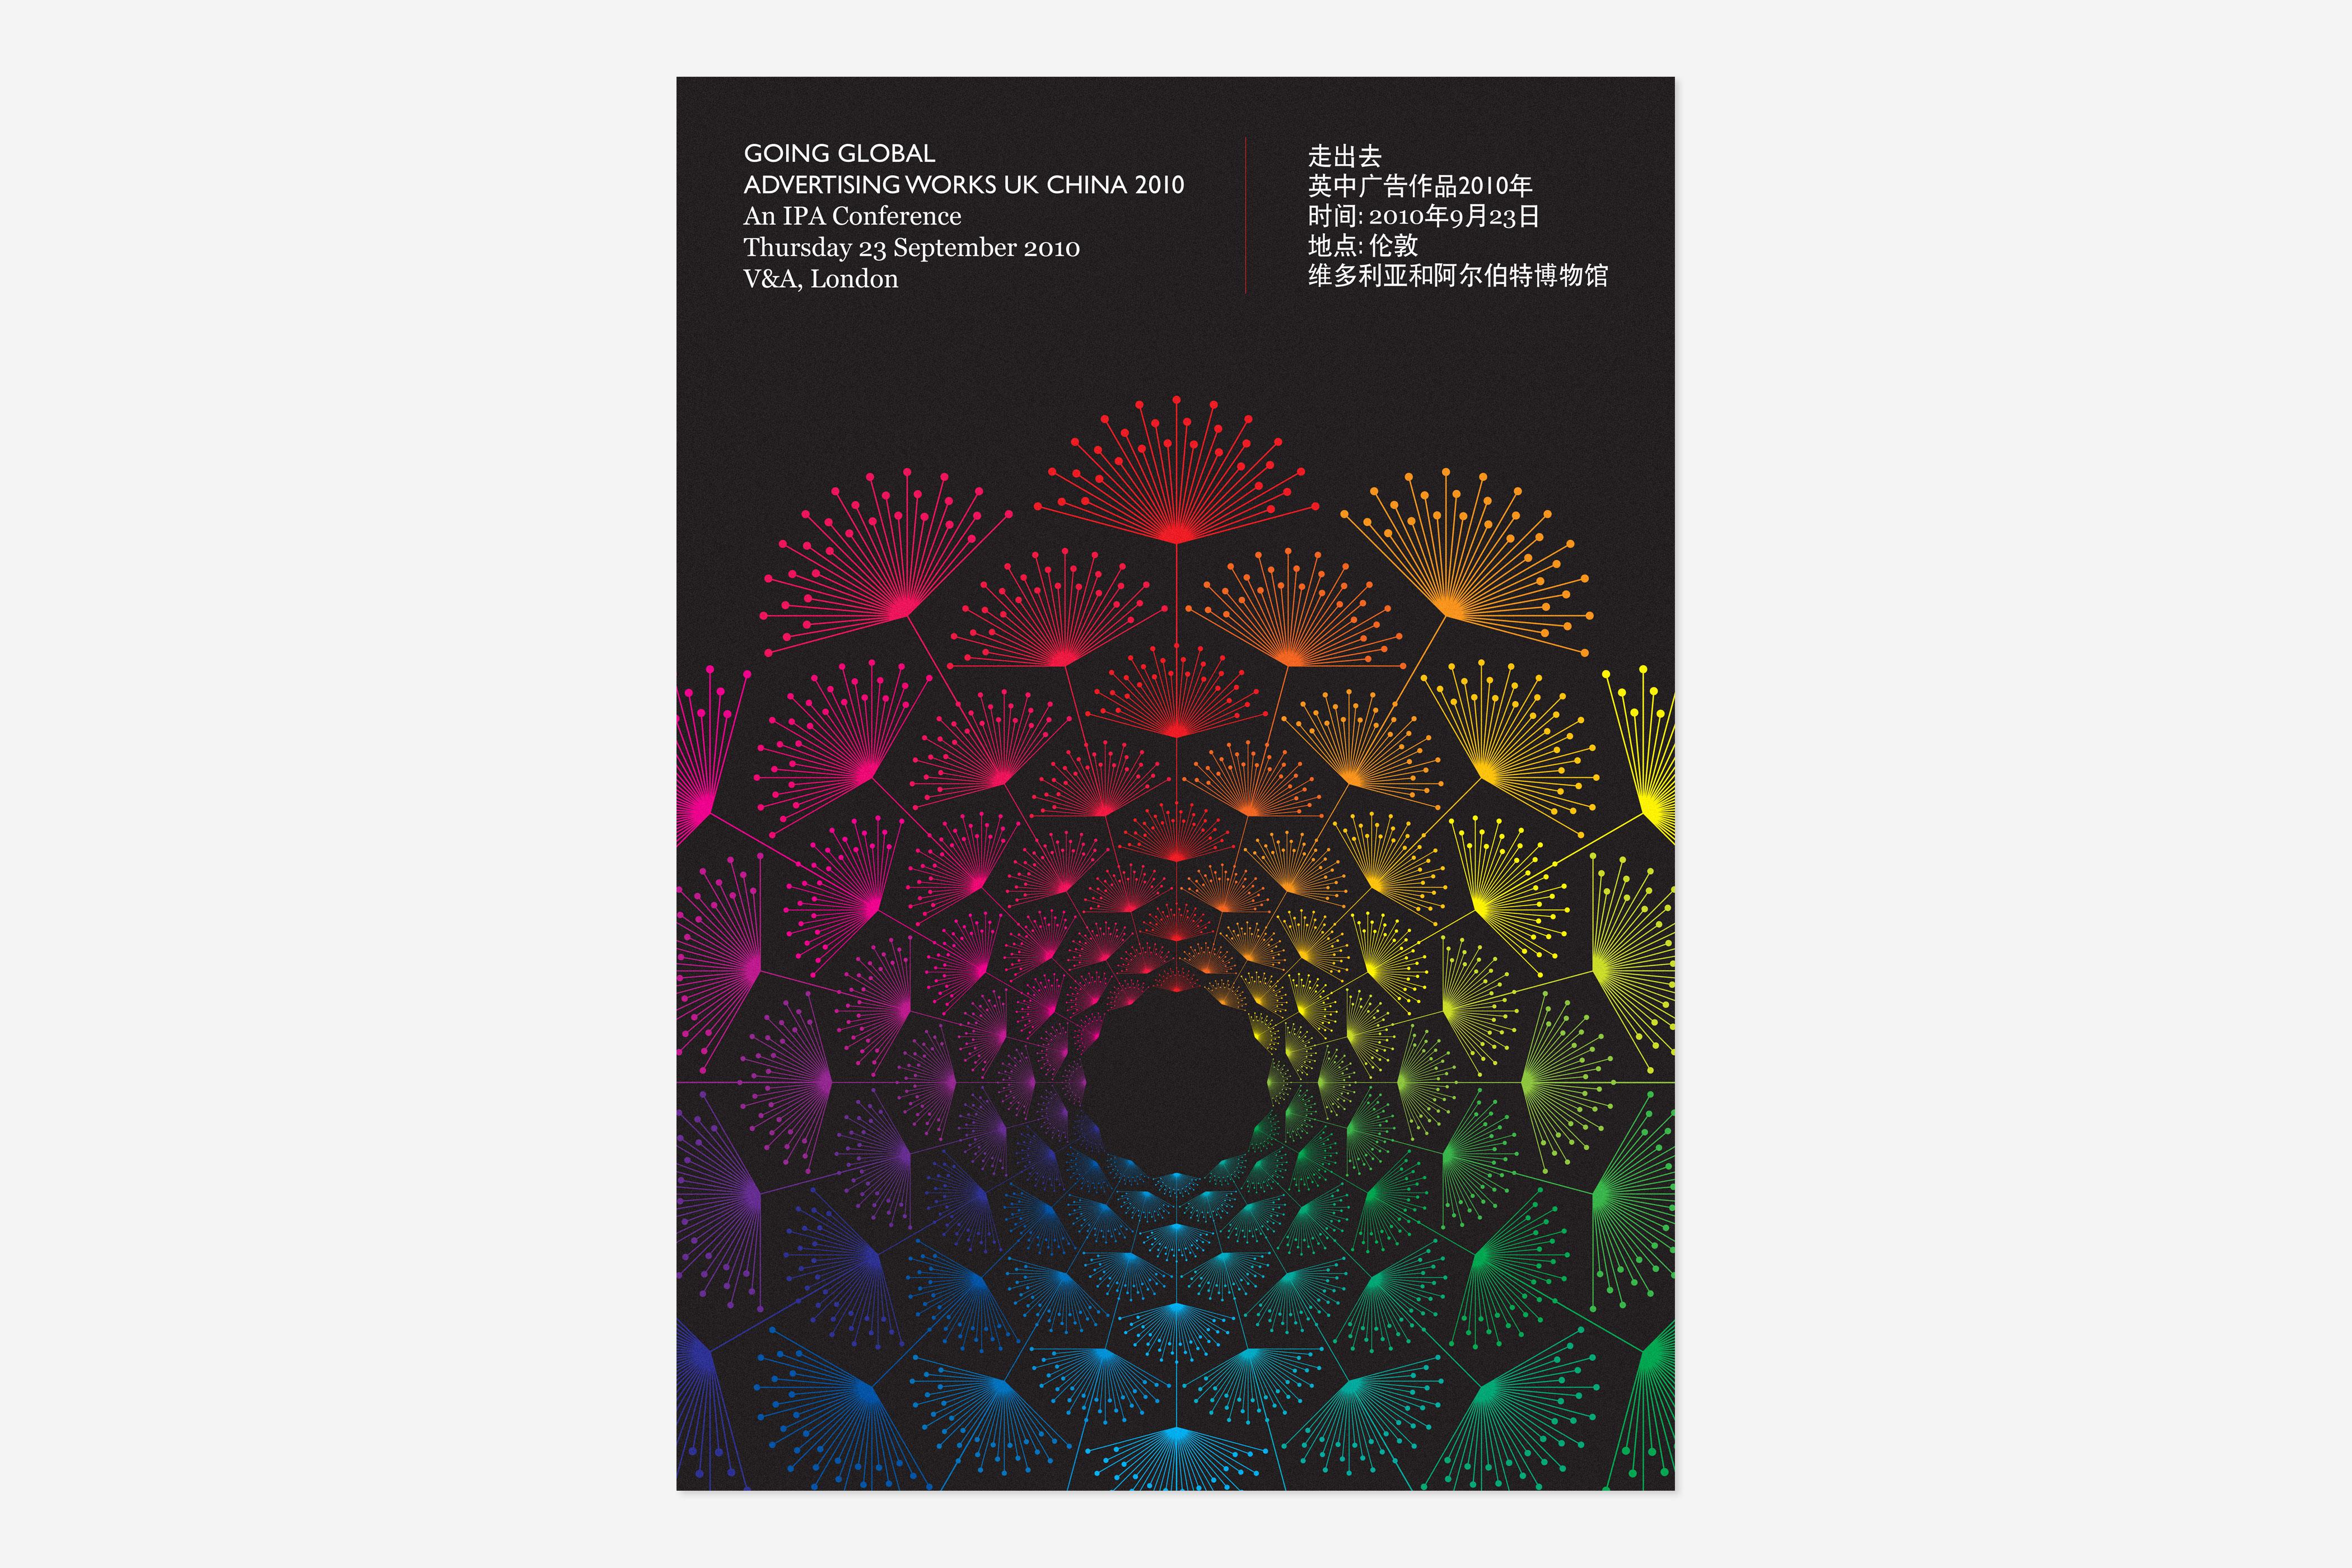 IPA_advertising-works-poster